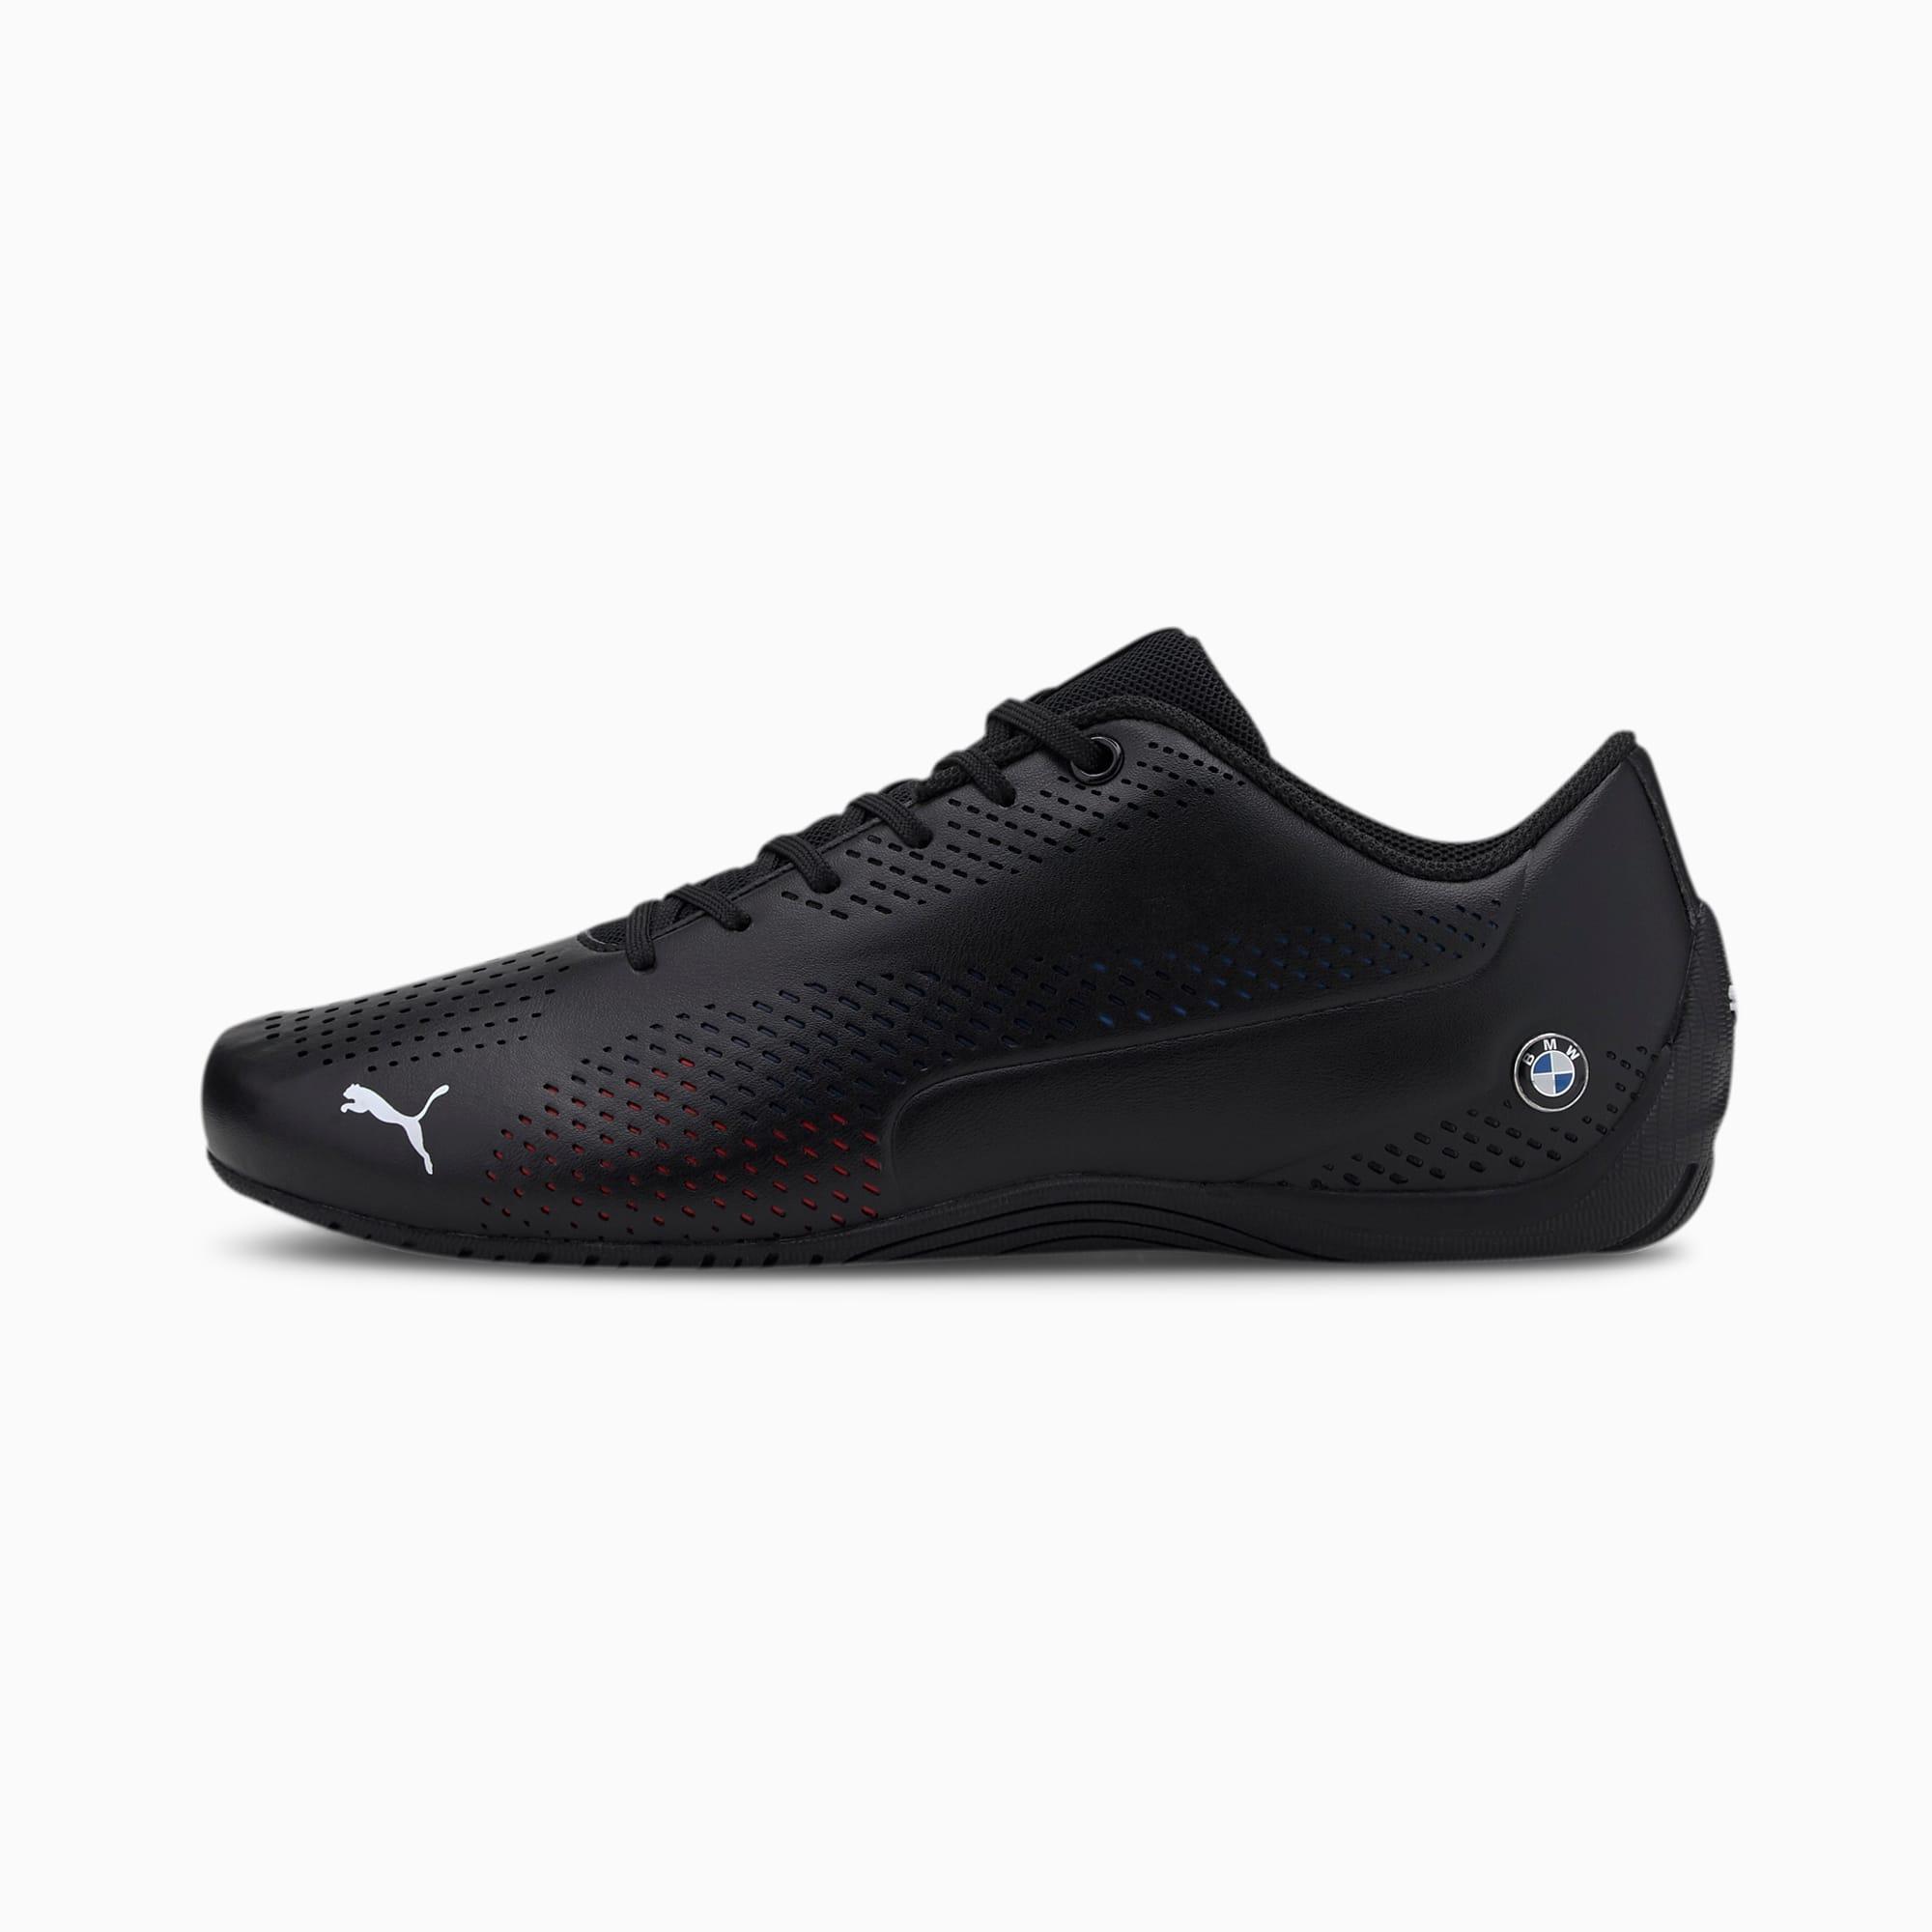 Puma Sneakers Online Udsalg | Puma Bmw M Motorsport Drift